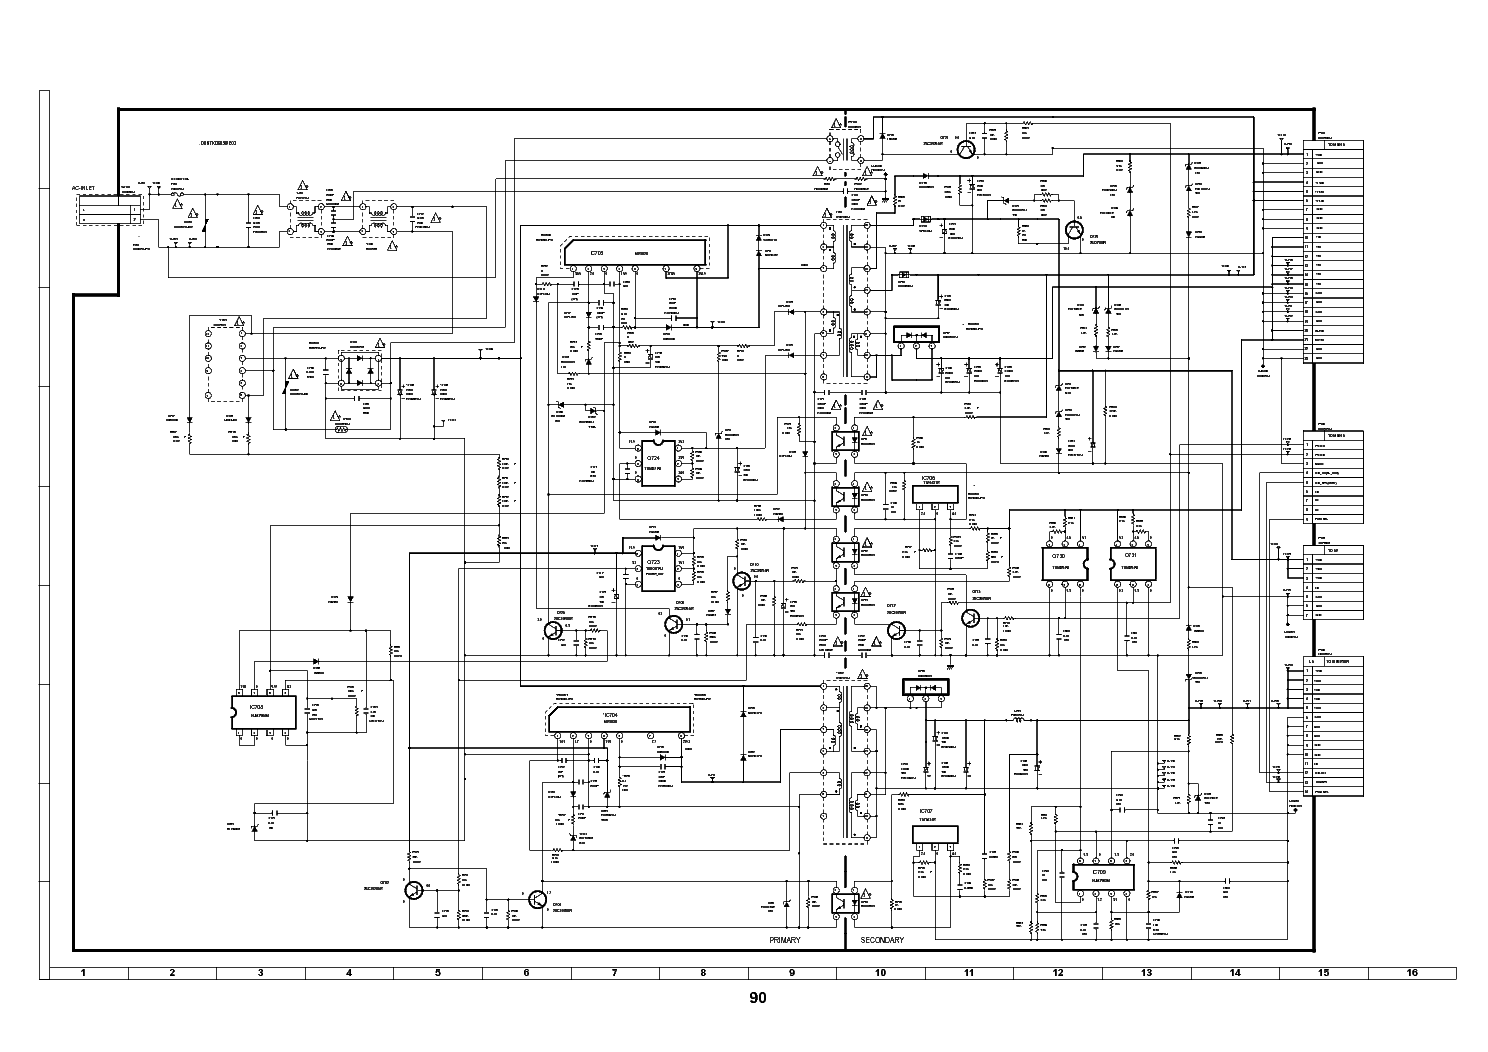 sharp duntkd605we03 qpwbsd605wjn3 sch service manual download  schematics  eeprom  repair info